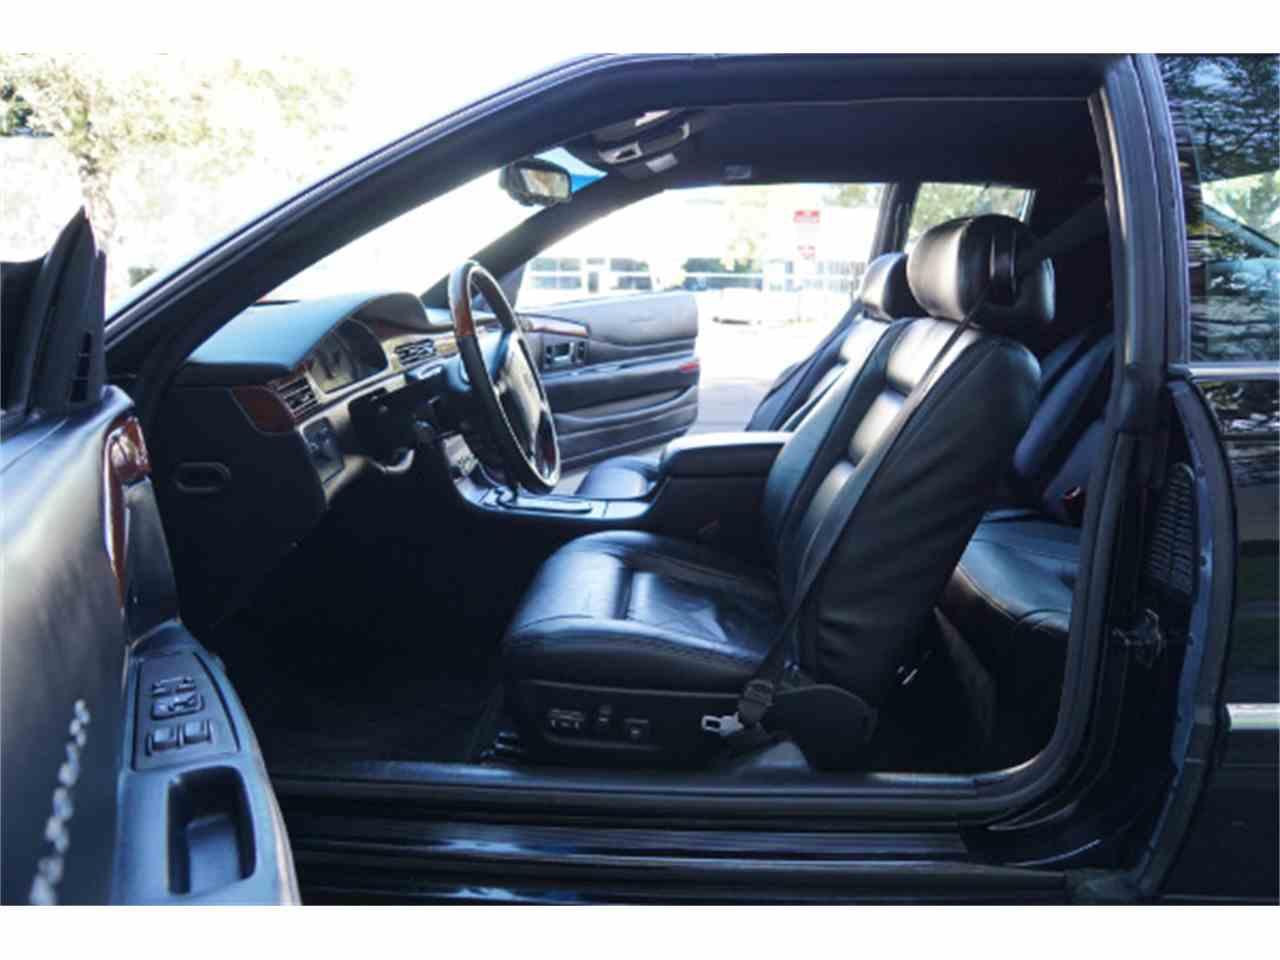 Large Picture of '02 Cadillac Eldorado located in Santa Monica California Auction Vehicle - MZJA